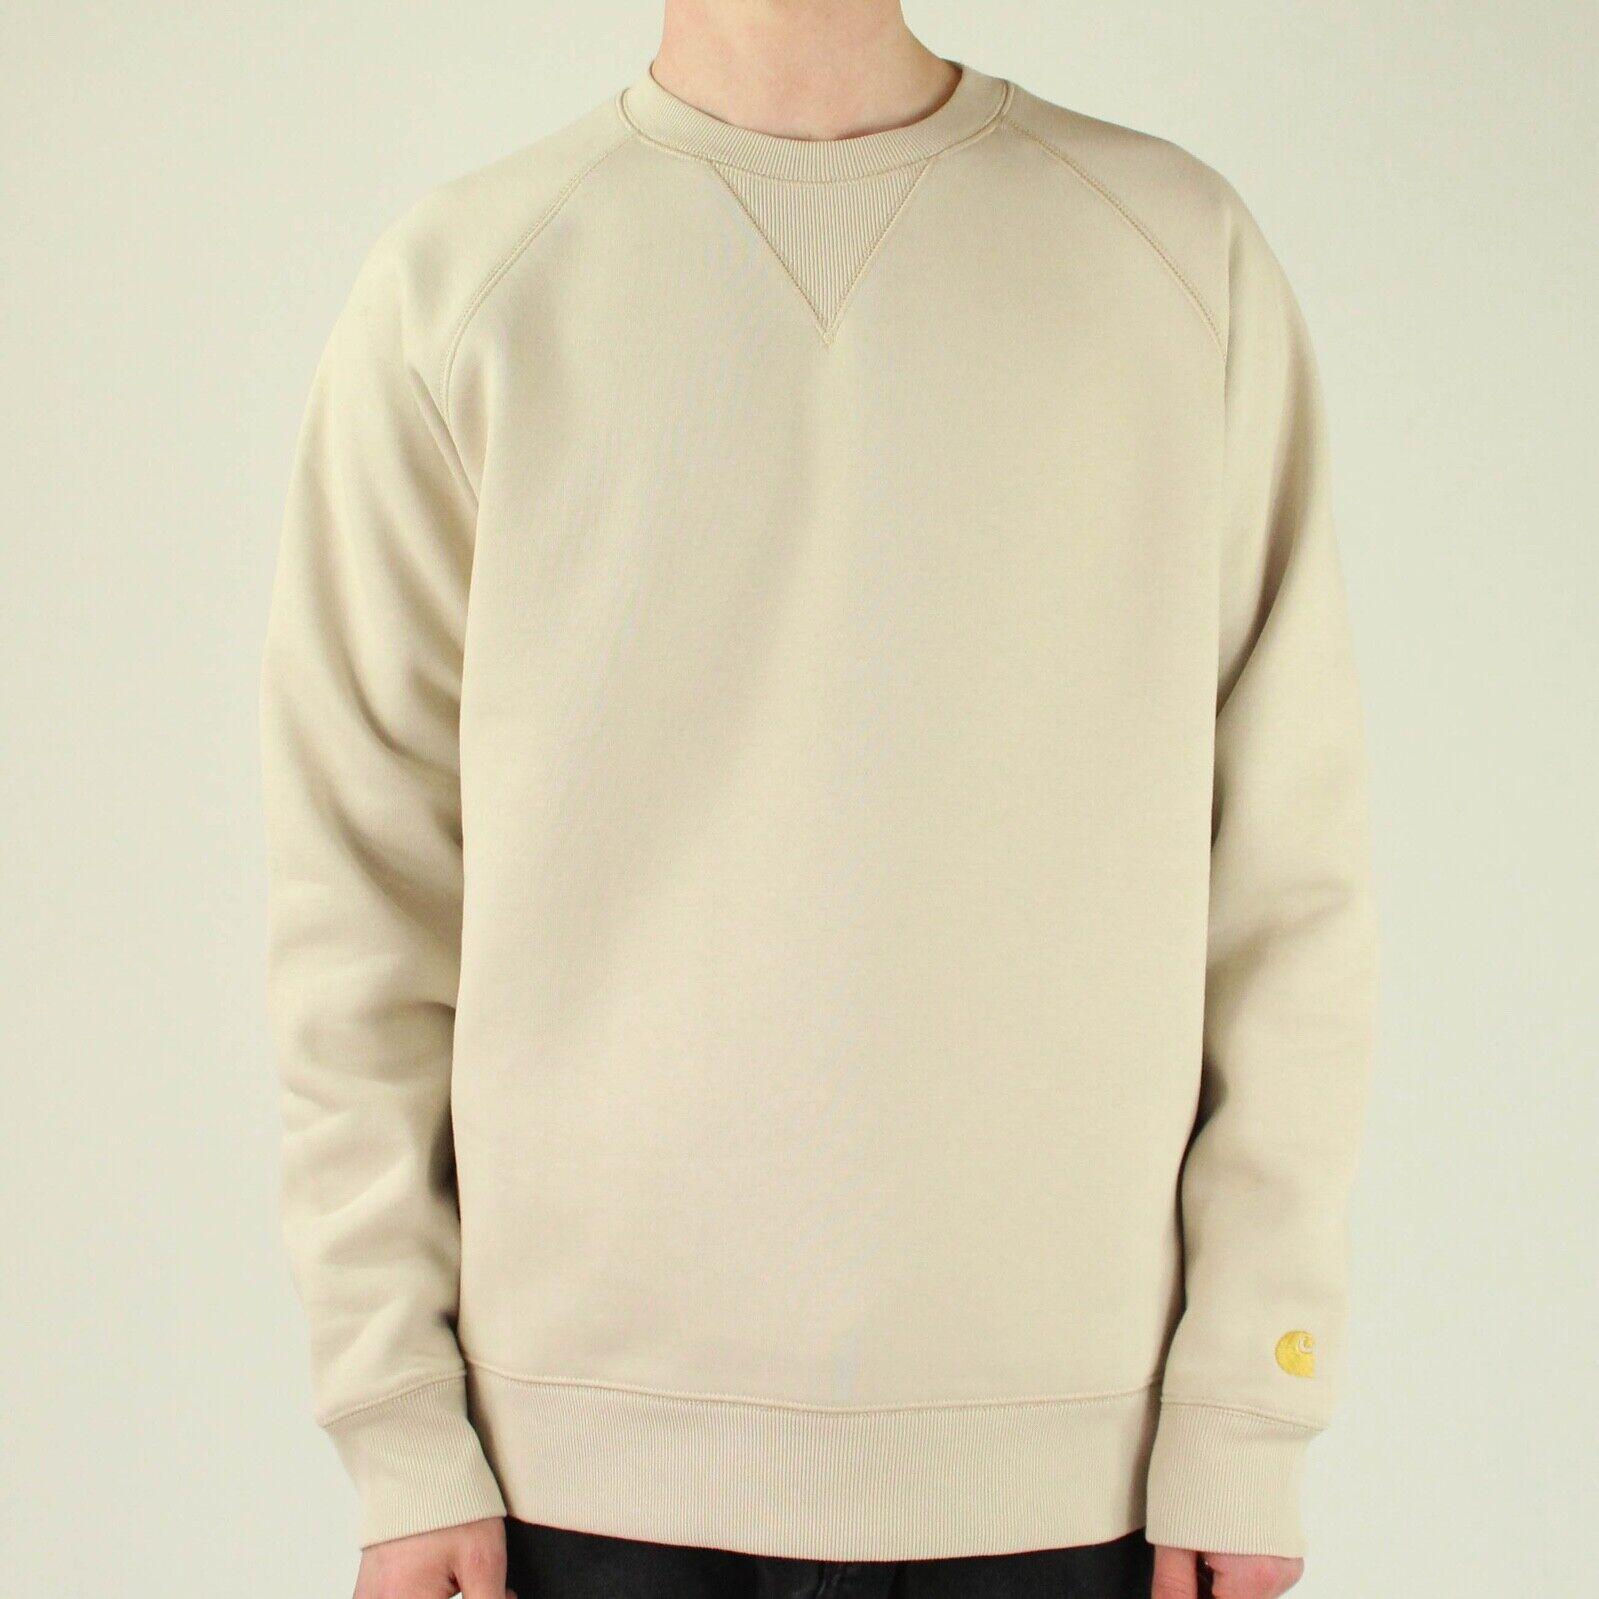 Carhartt Crewneck Sweatshirt Pullover Sweater Dark Blue Jumper Navy Blue